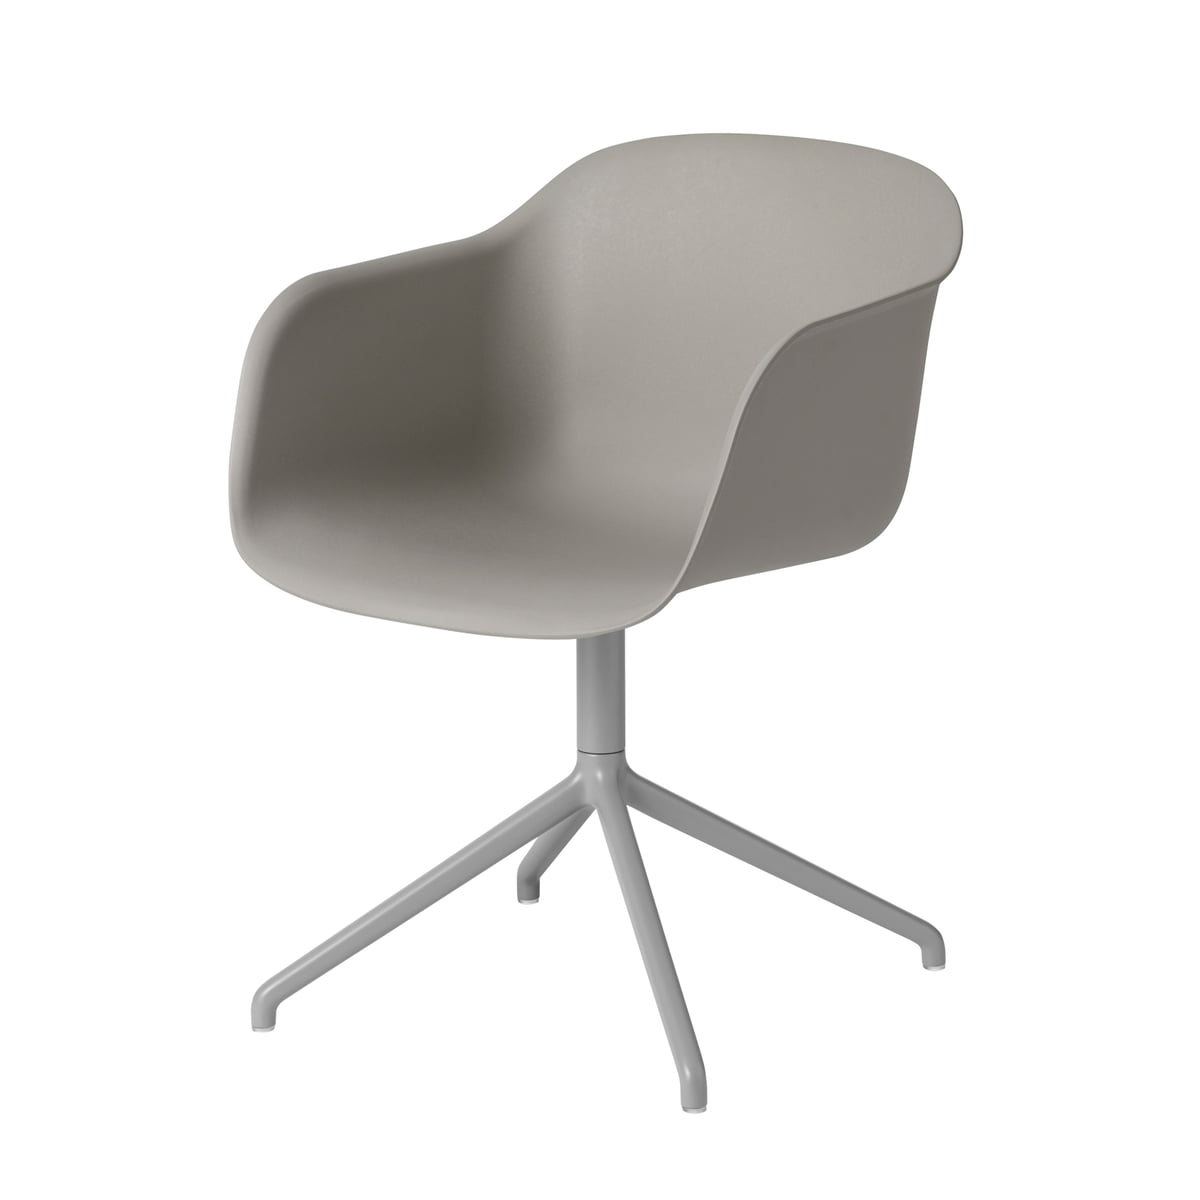 Superb Muuto   Fiber Chair   Swivel Base, Grey / Grey